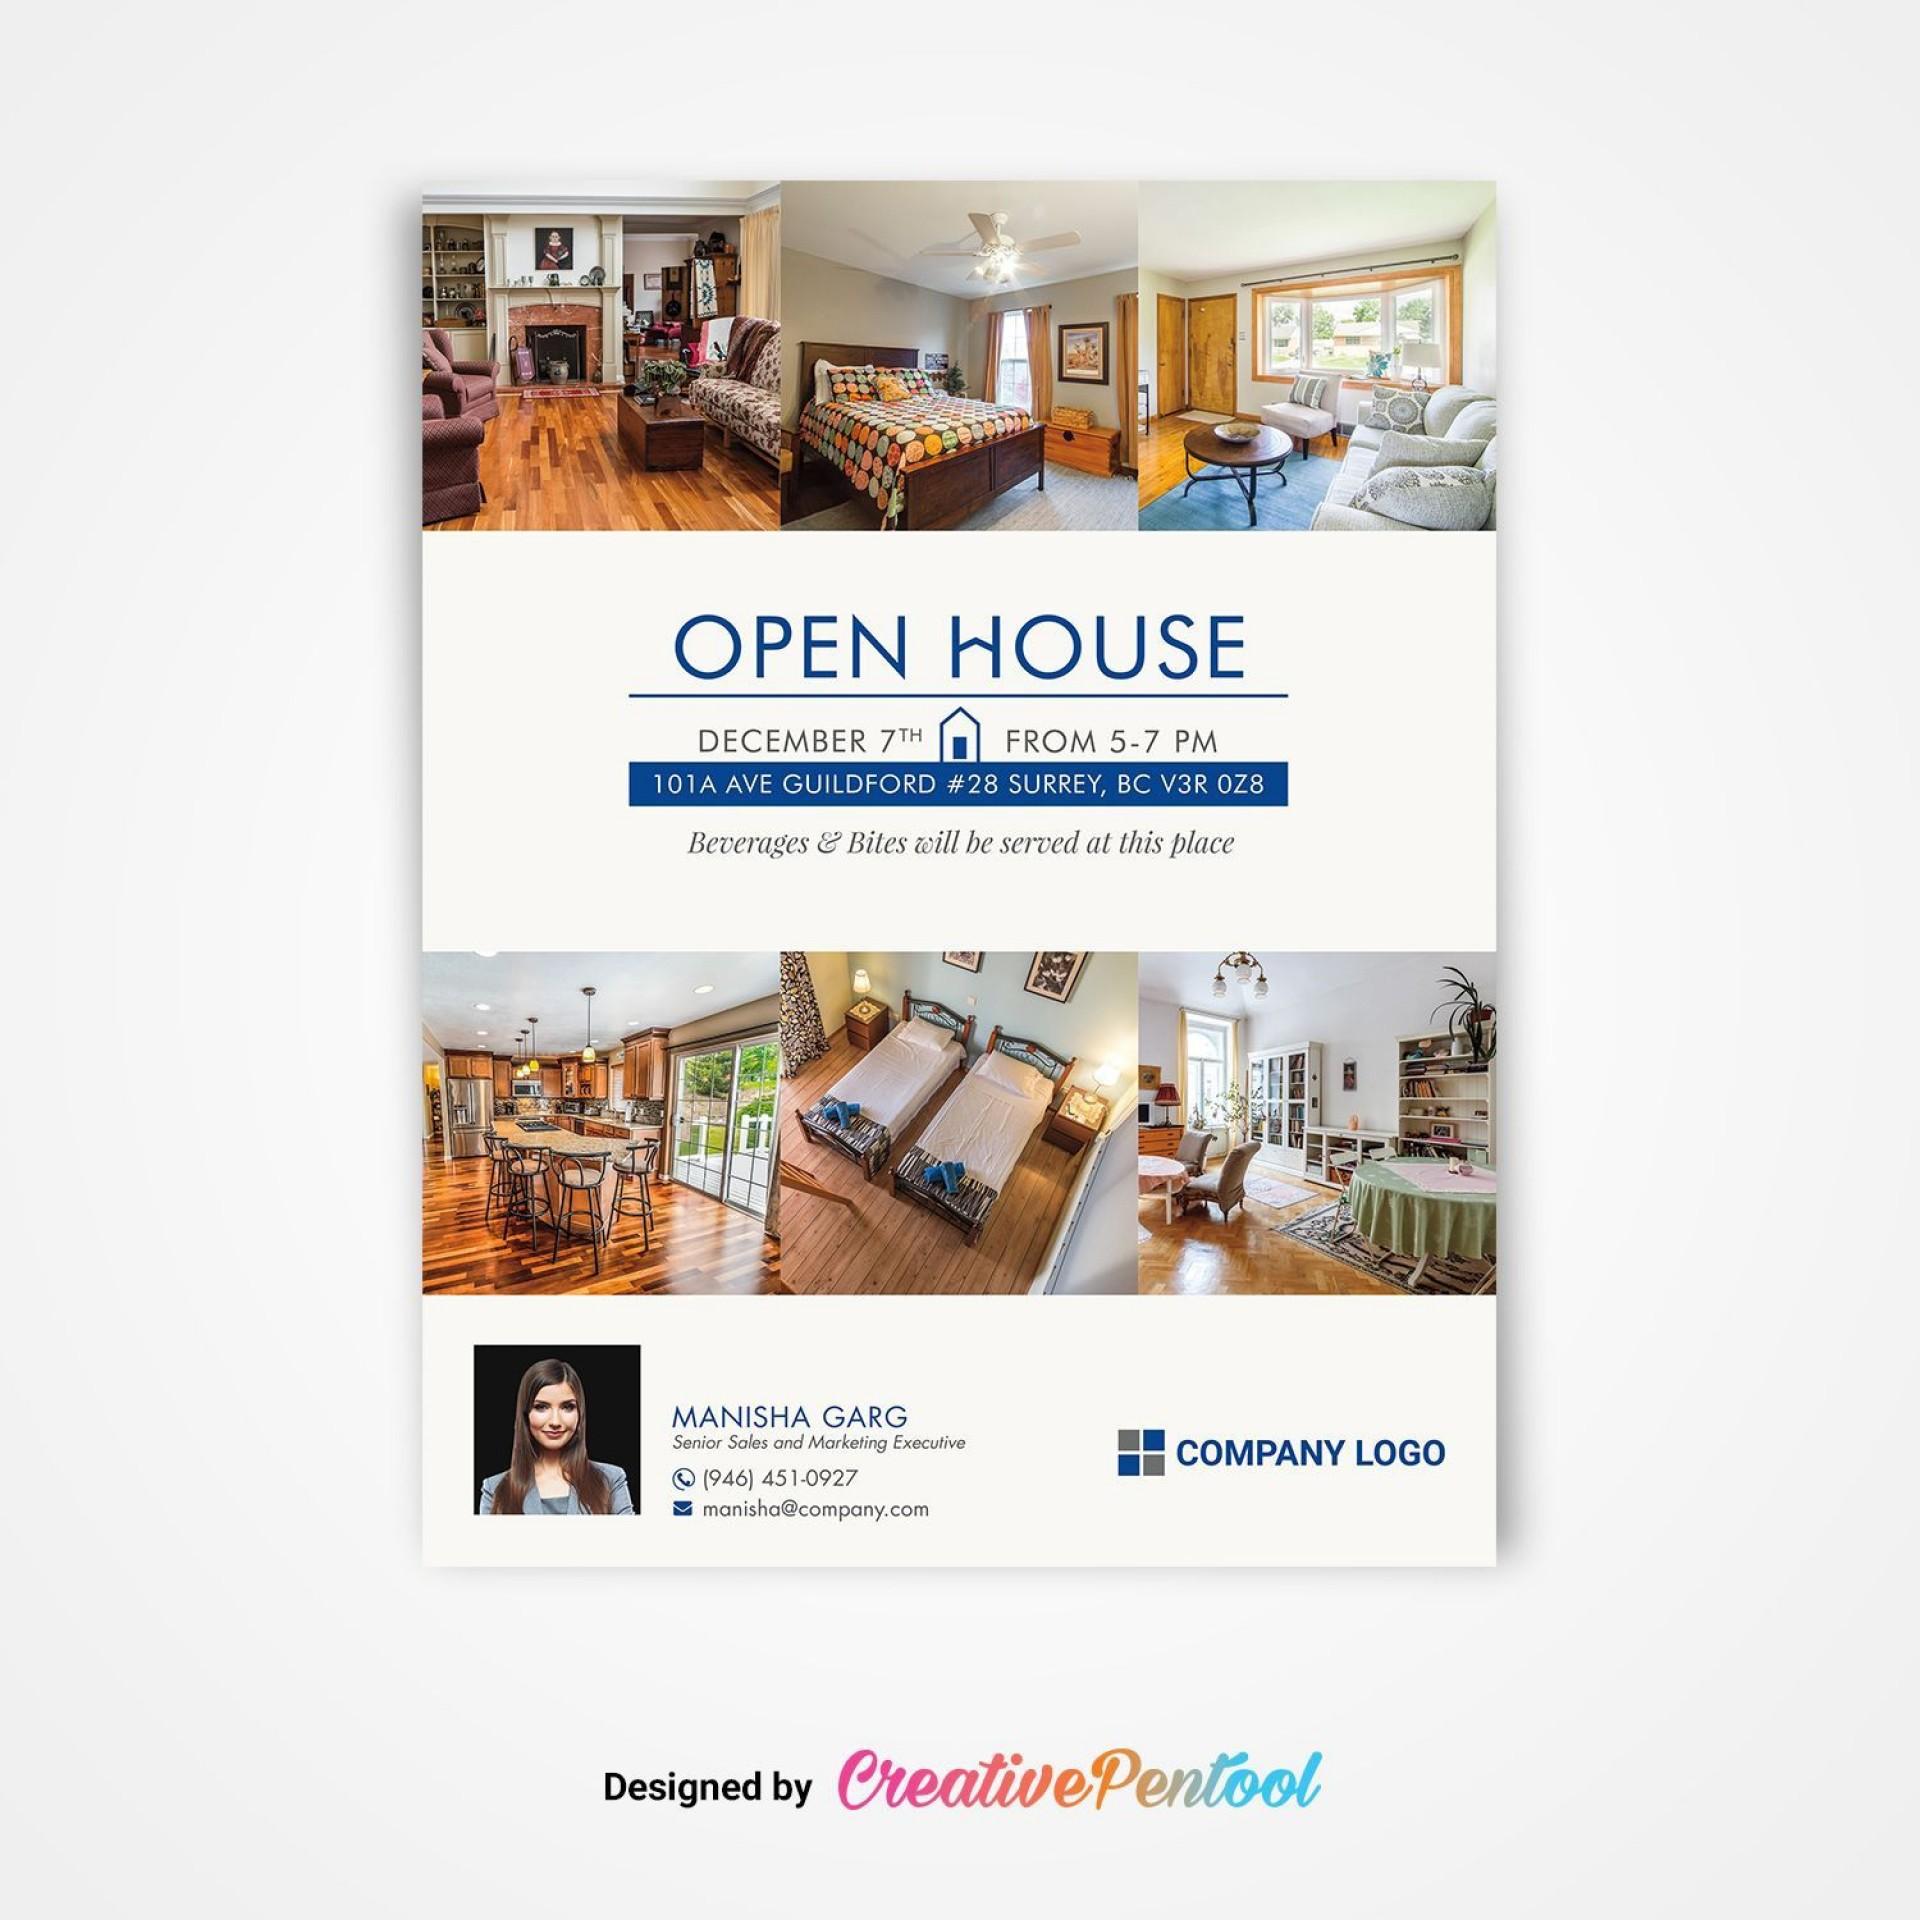 002 Stunning Open House Flyer Template Free Design  Holiday Preschool School Microsoft1920